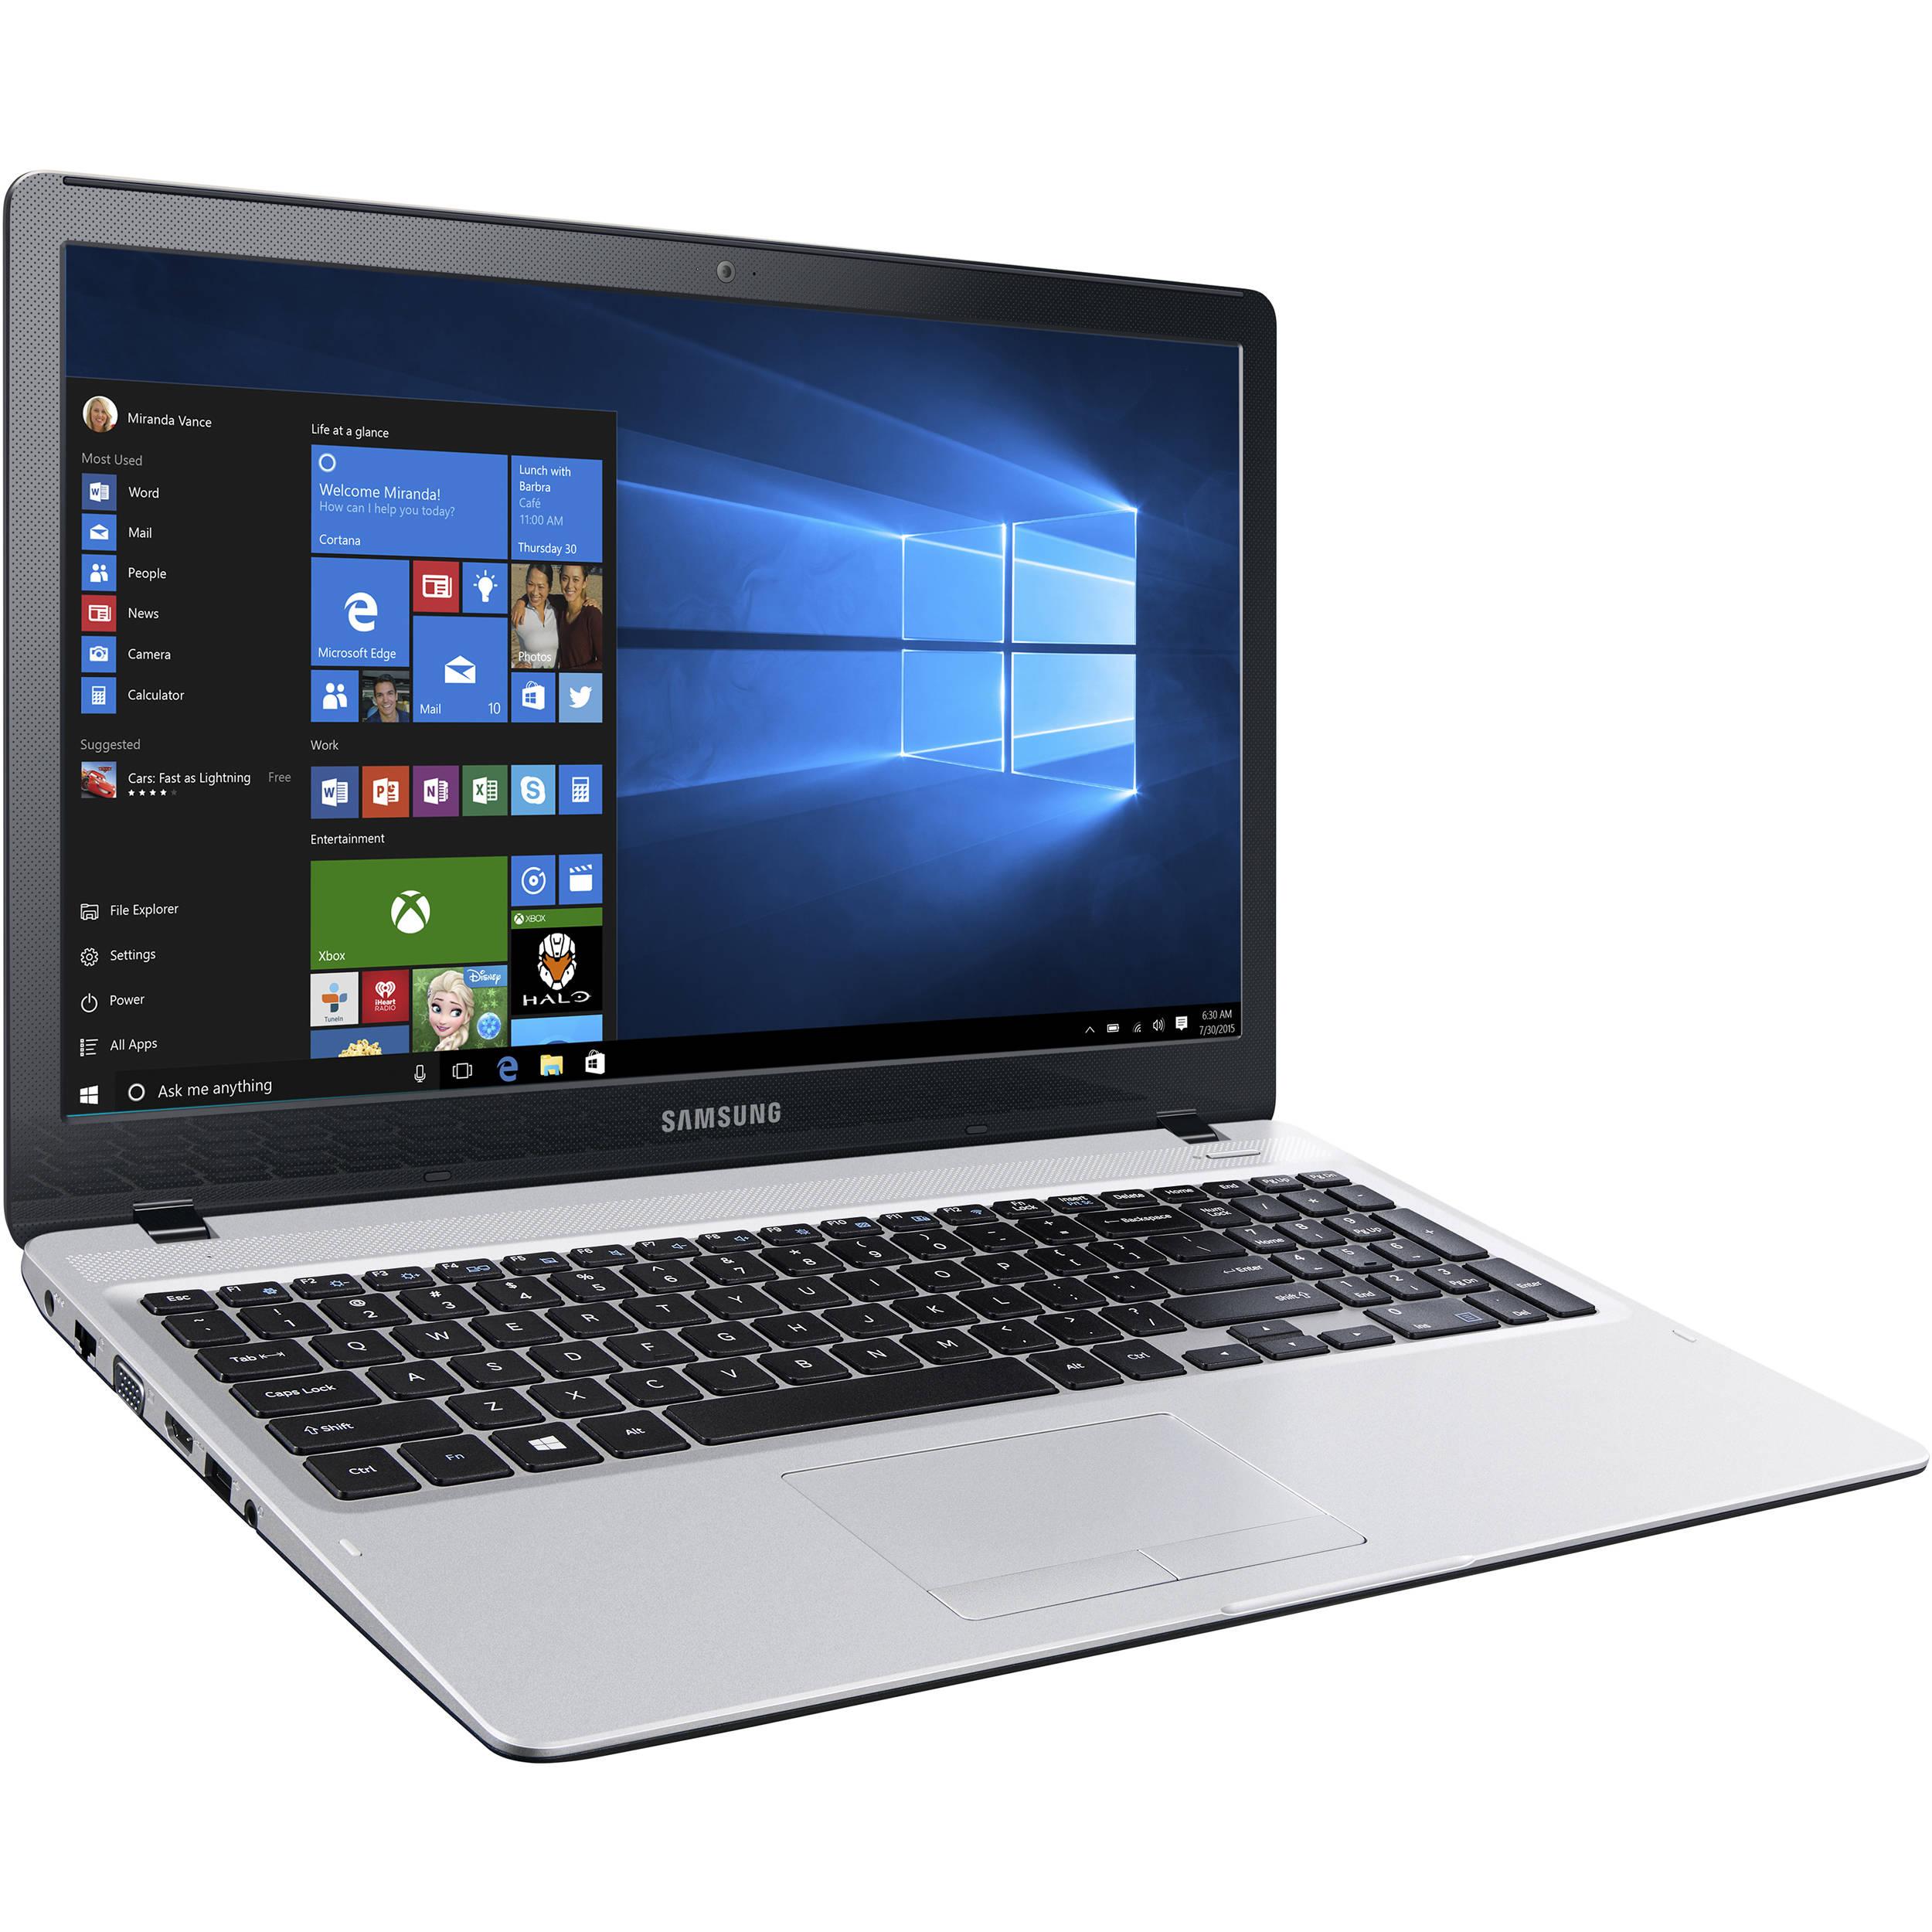 Samsung notebook in singapore - Samsung 15 6 Notebook 5